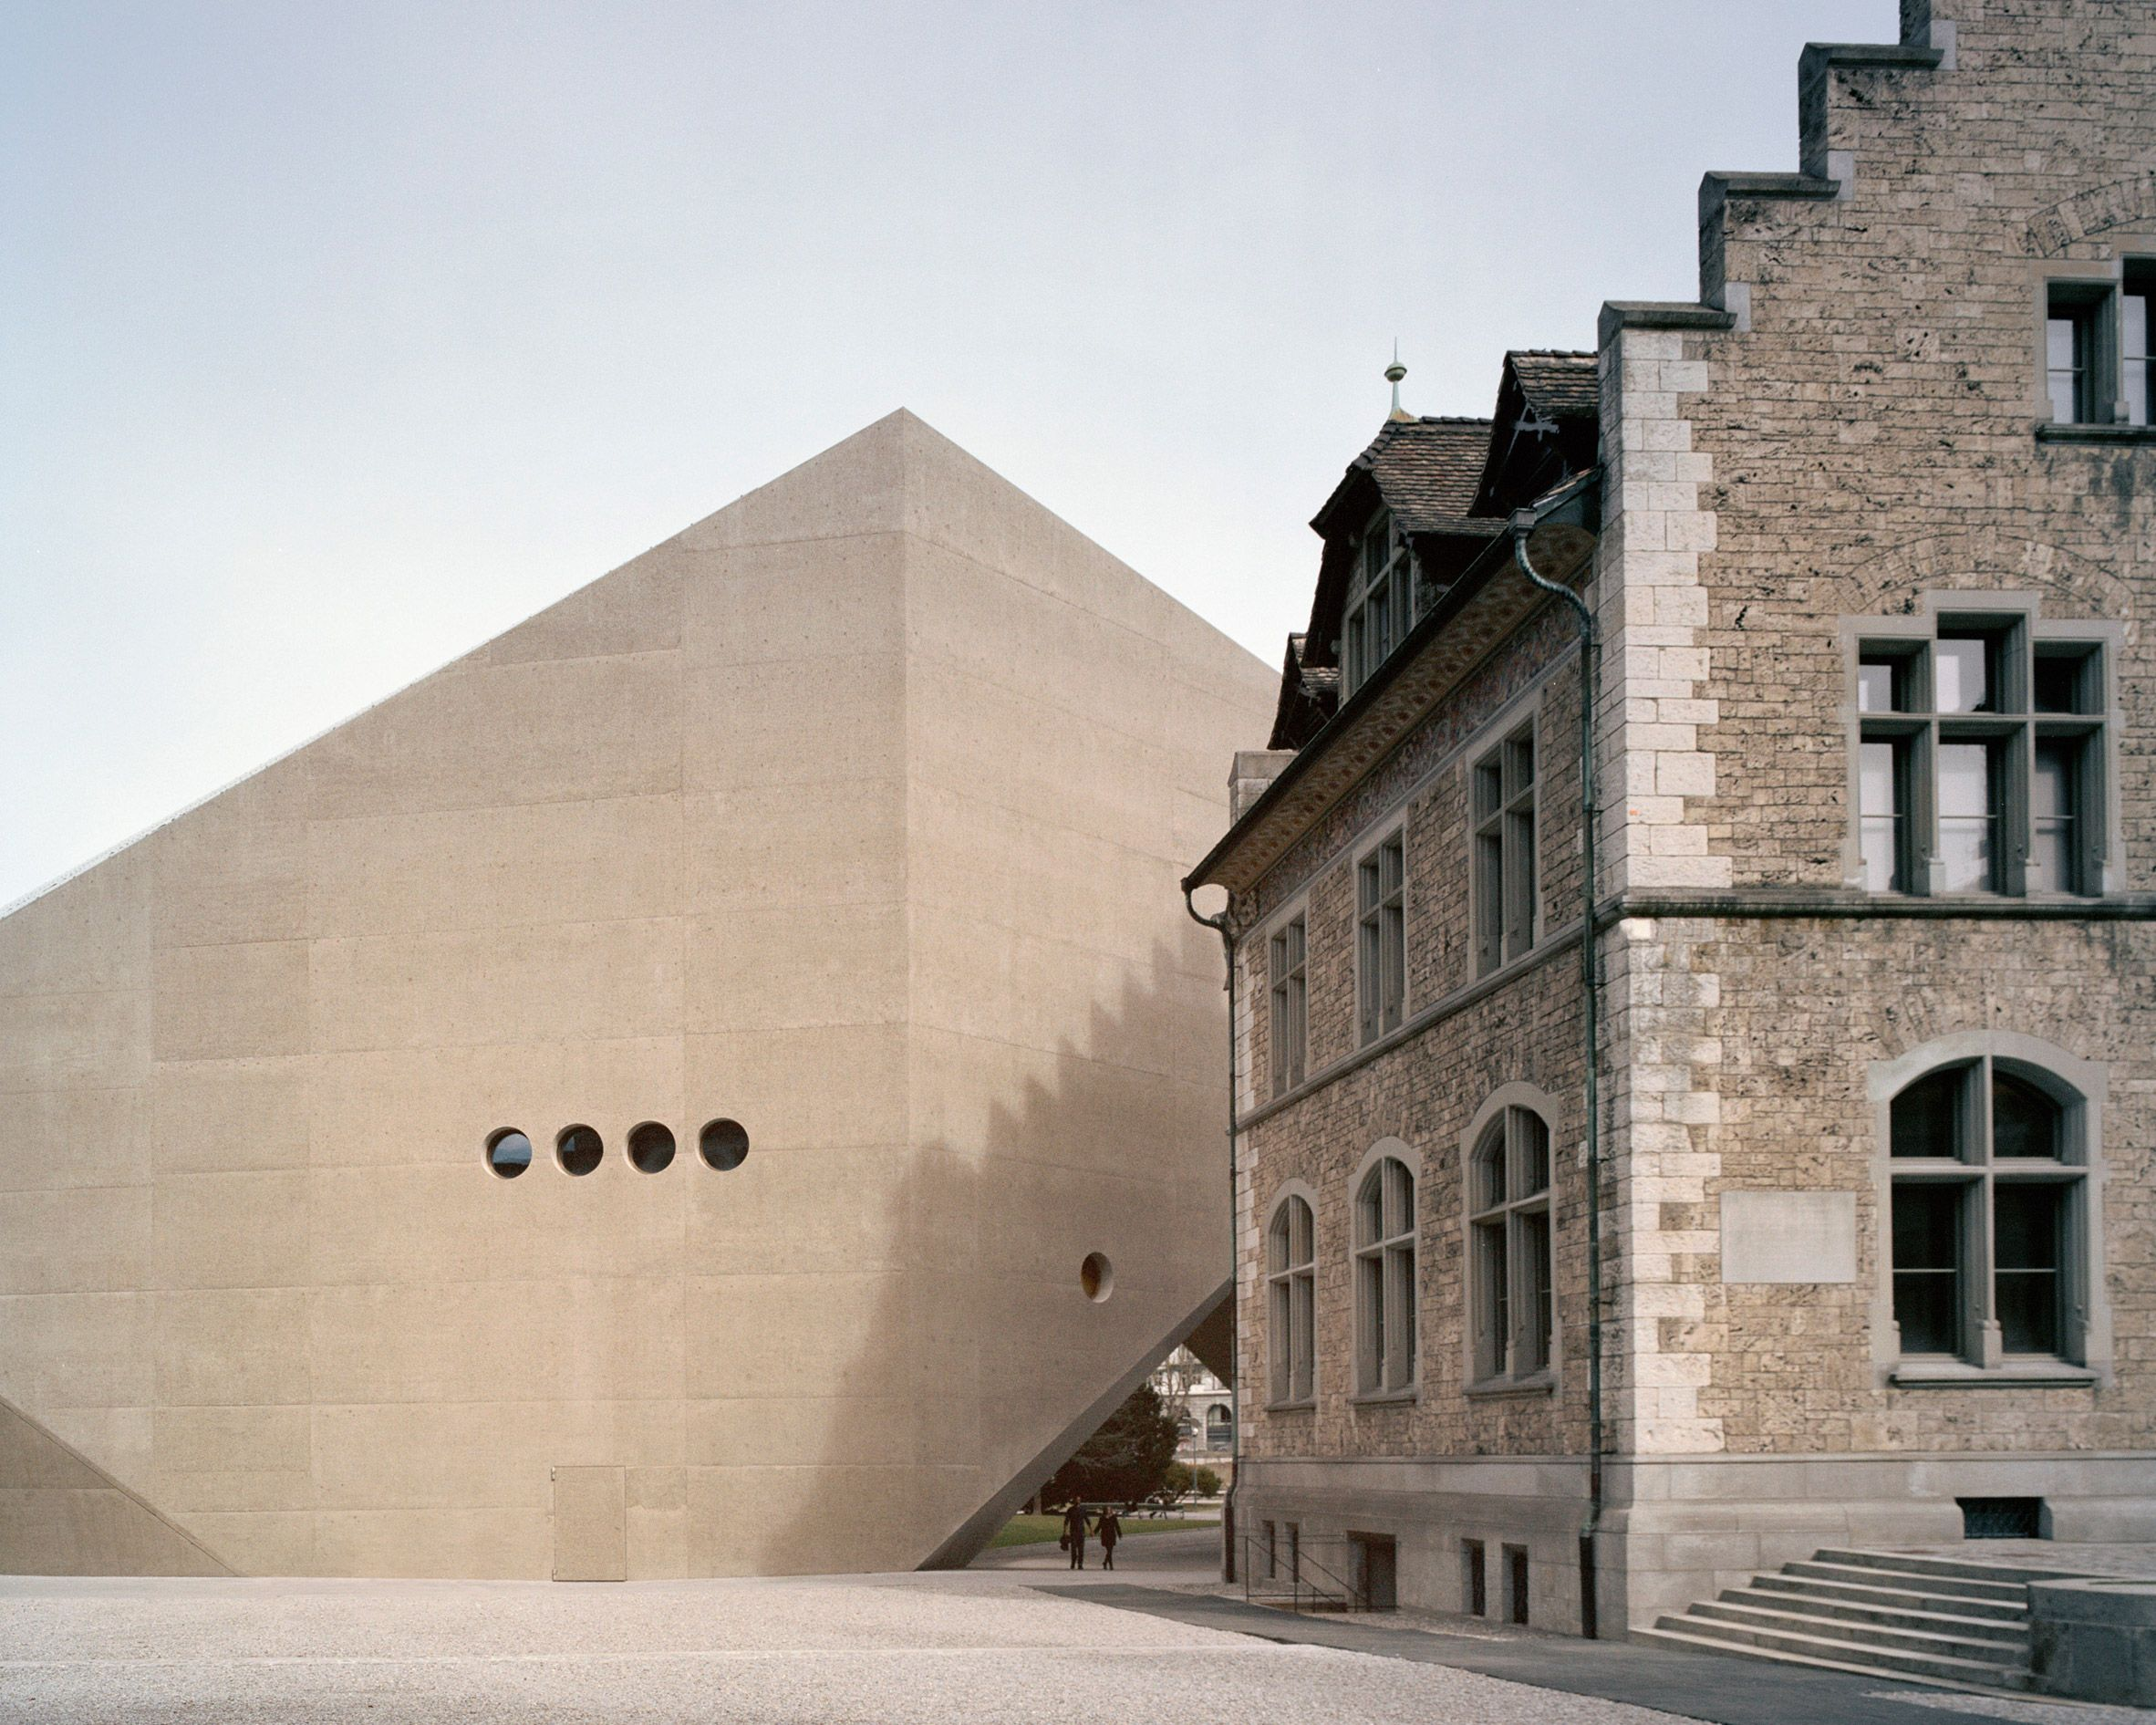 Rory Gardiner Photographs Christ Gantenbein S Museum Extension Arquitectura Concreto En Busca De La Felicidad